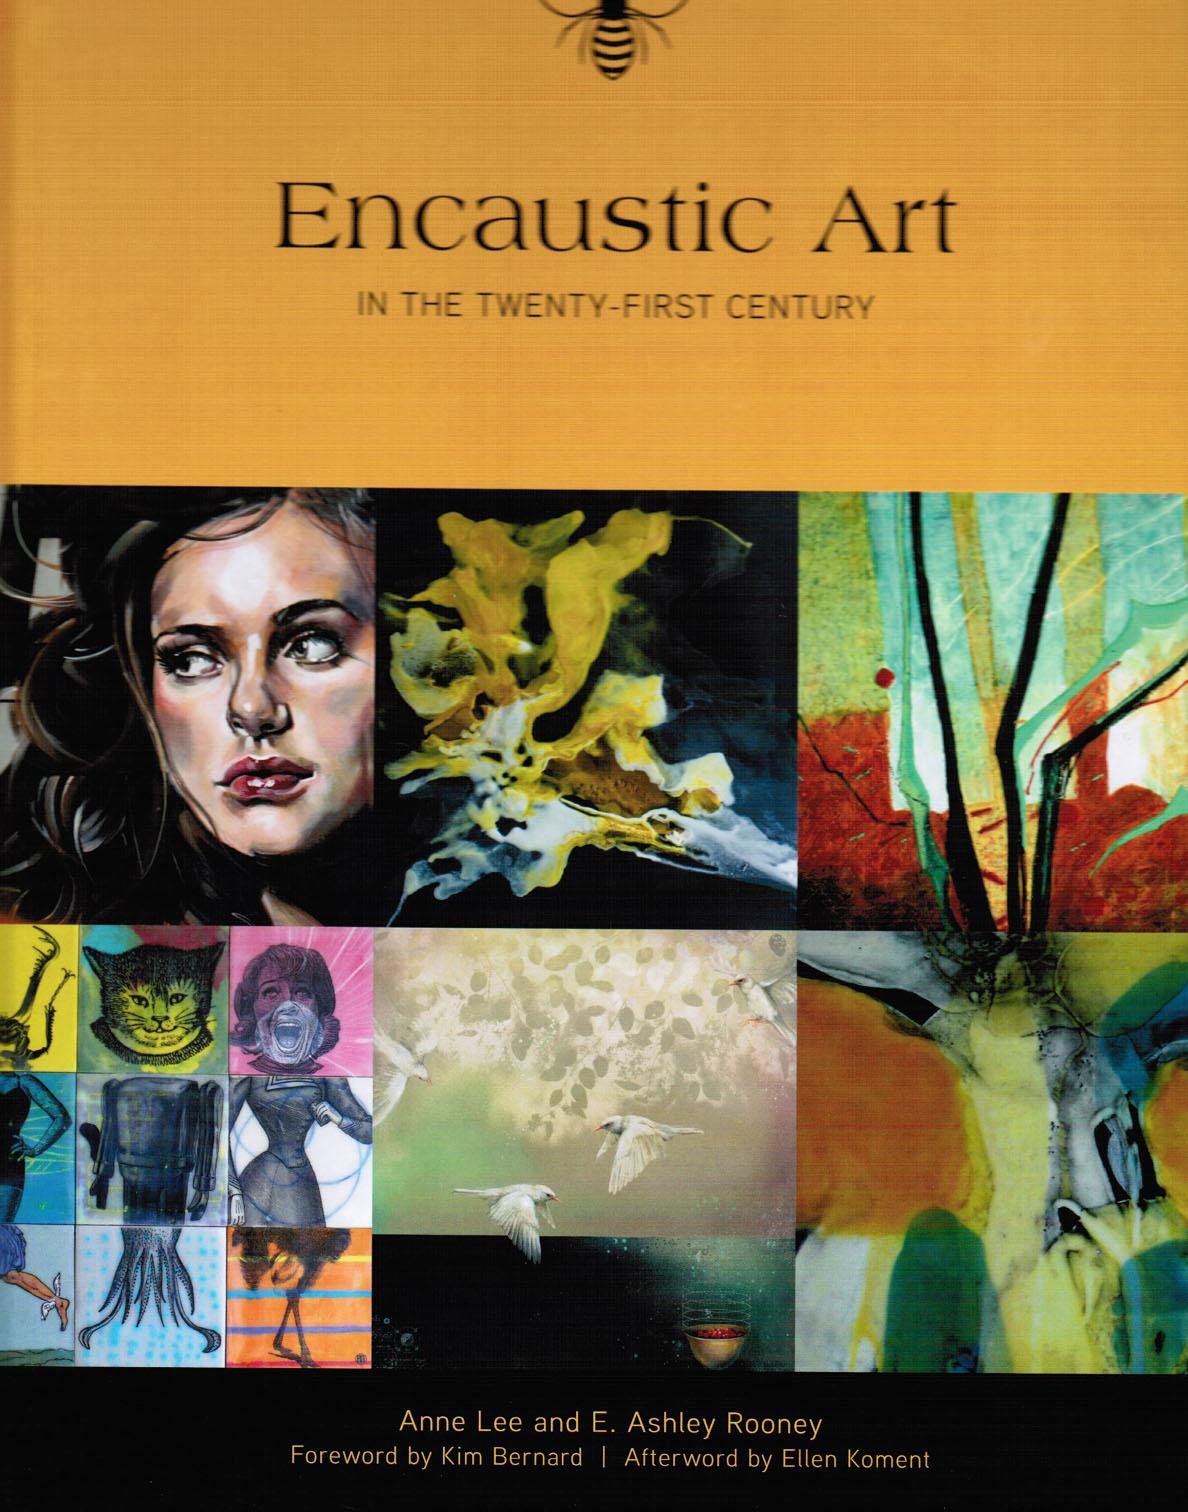 encaustic art in the twenty first century - cover.jpg